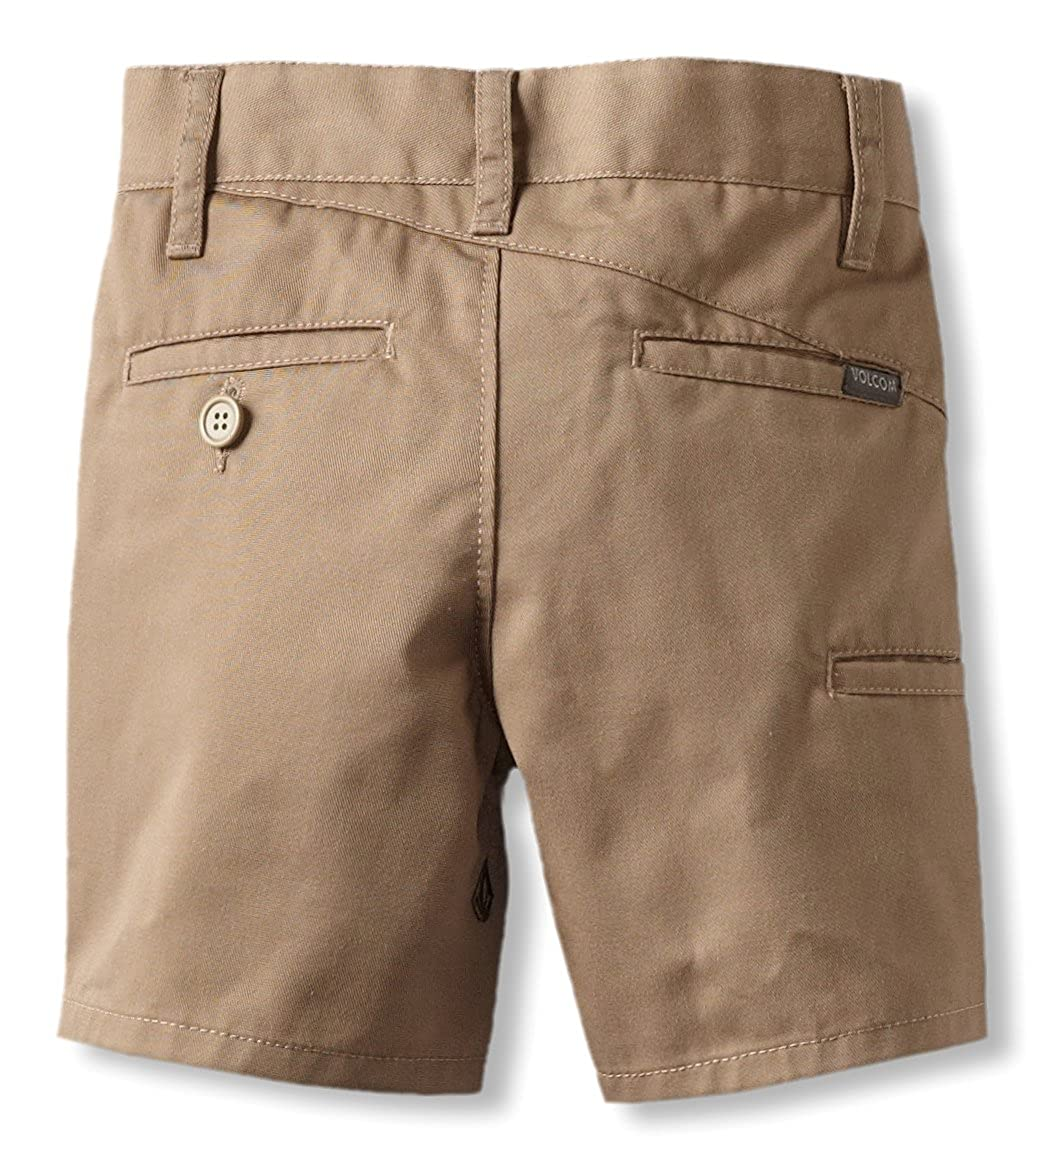 Volcom Little Boys Frickn Modern Short Volcom Boys 2-7 Y0931108